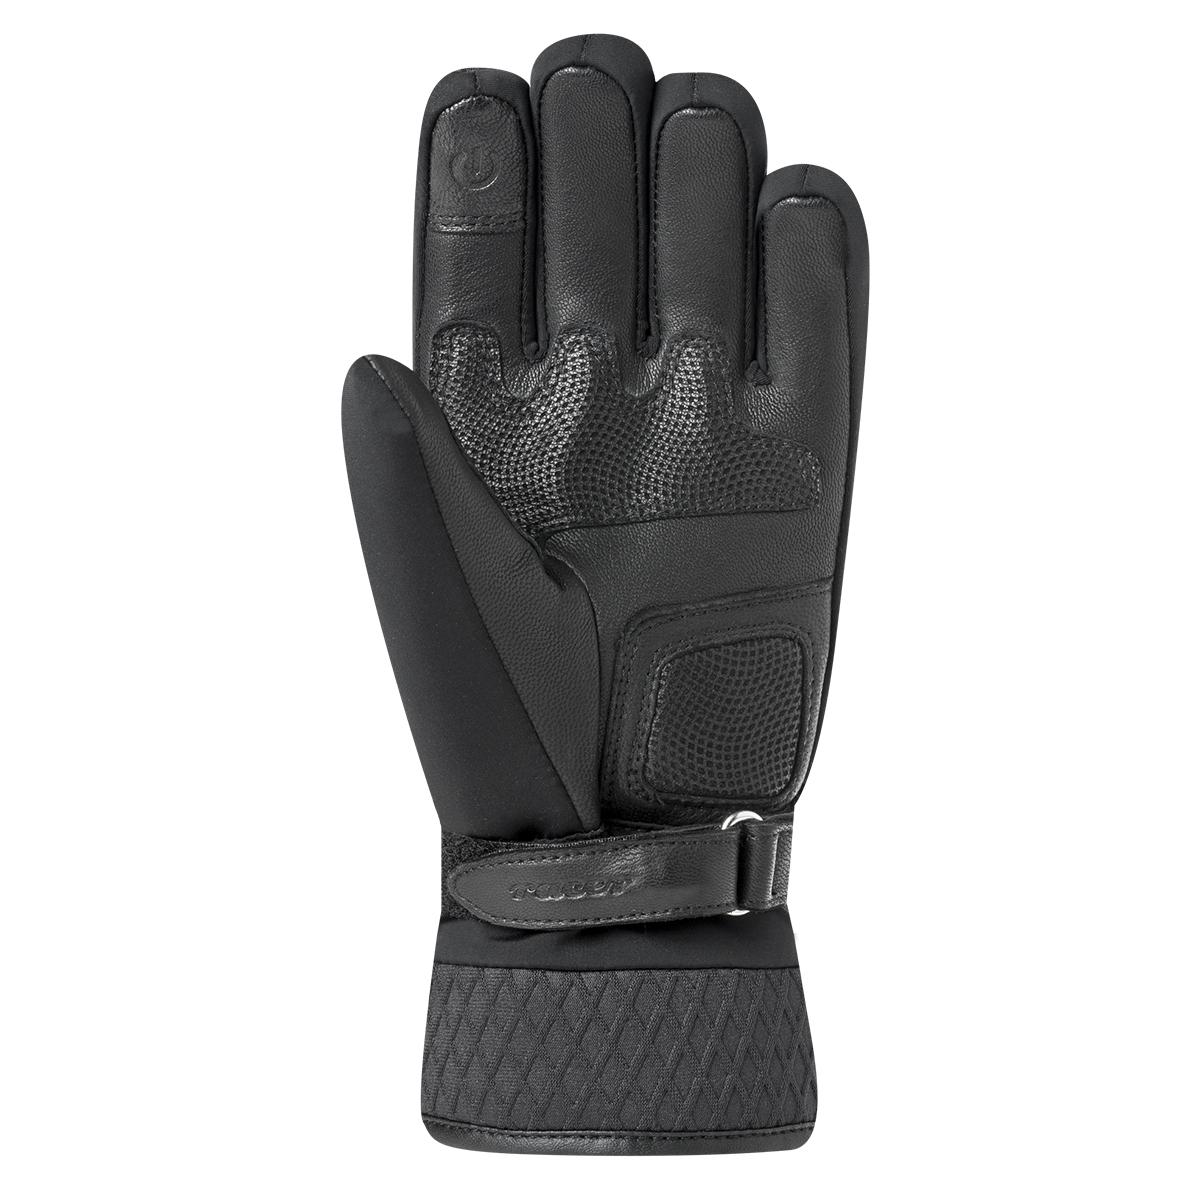 Racer Sara Ladies Glove - Black